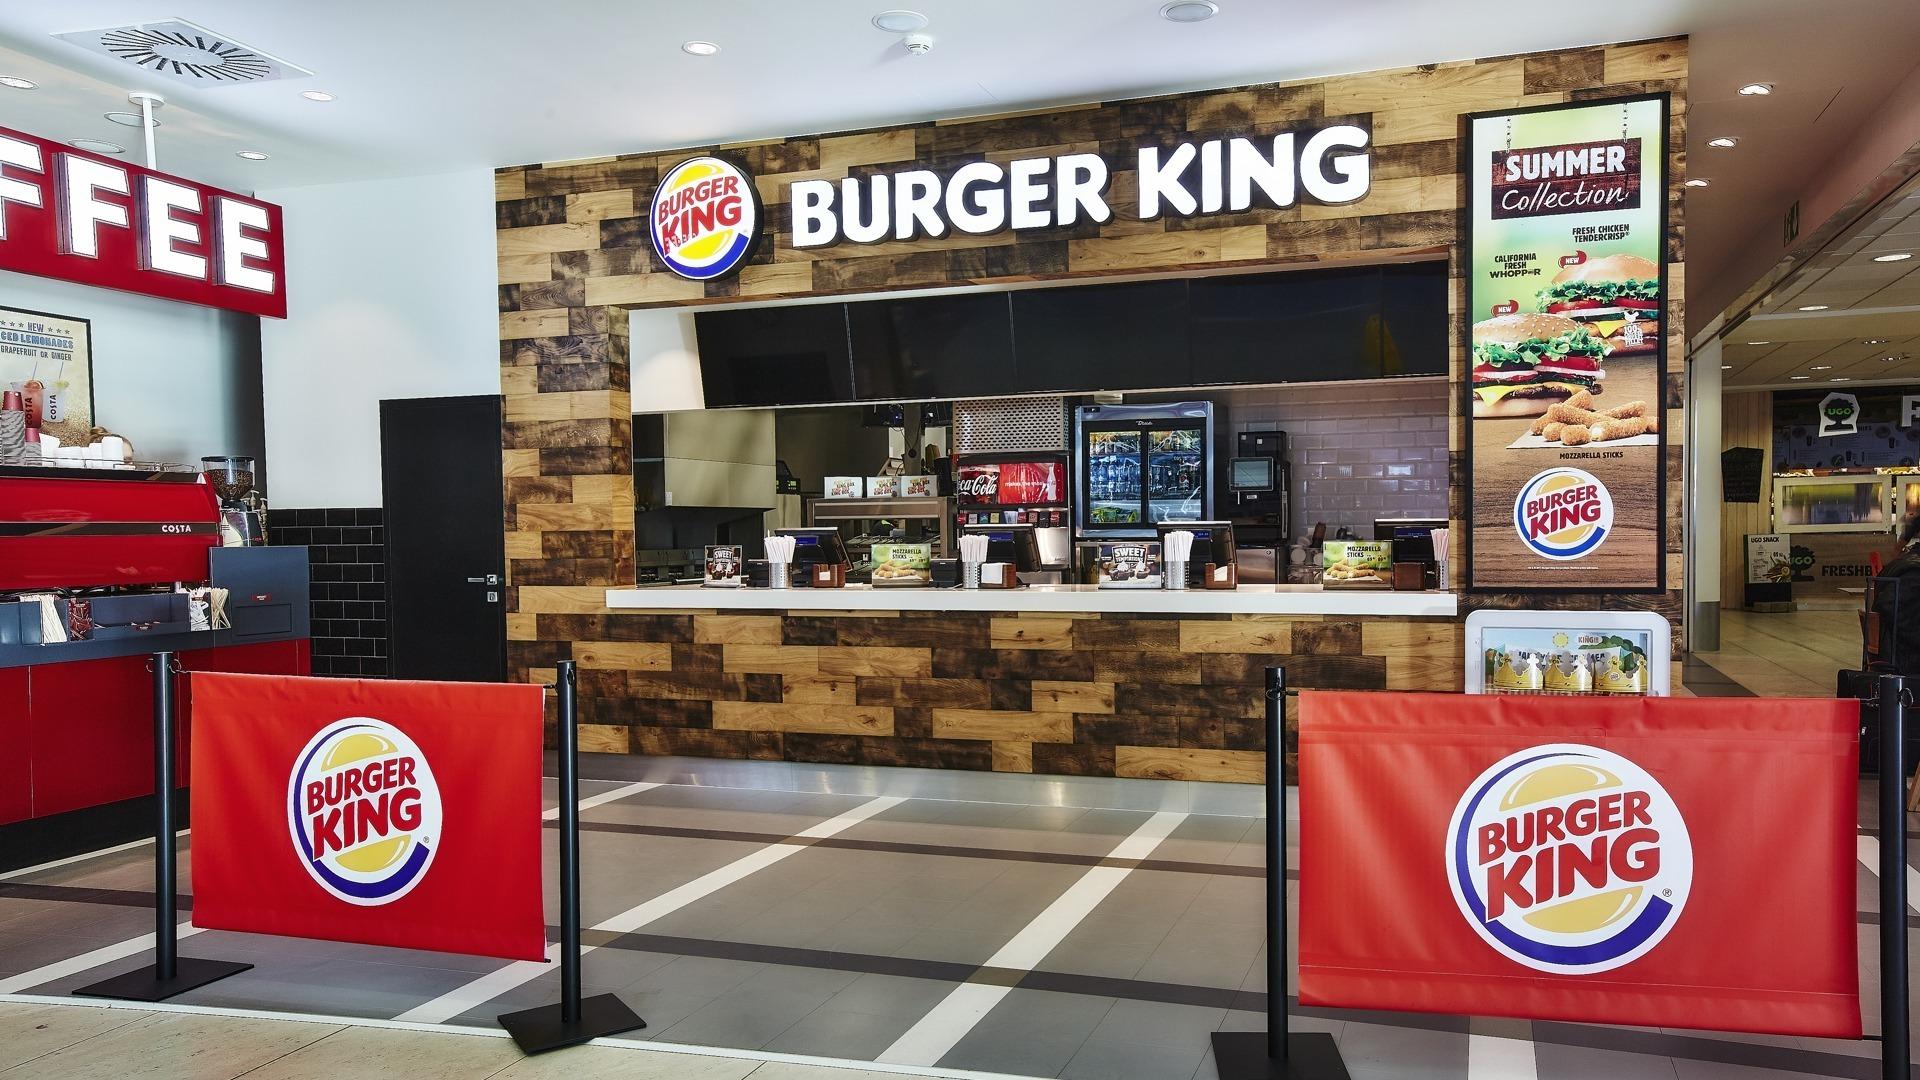 FESCHU Burger King Letiste Praha celkovy pohled